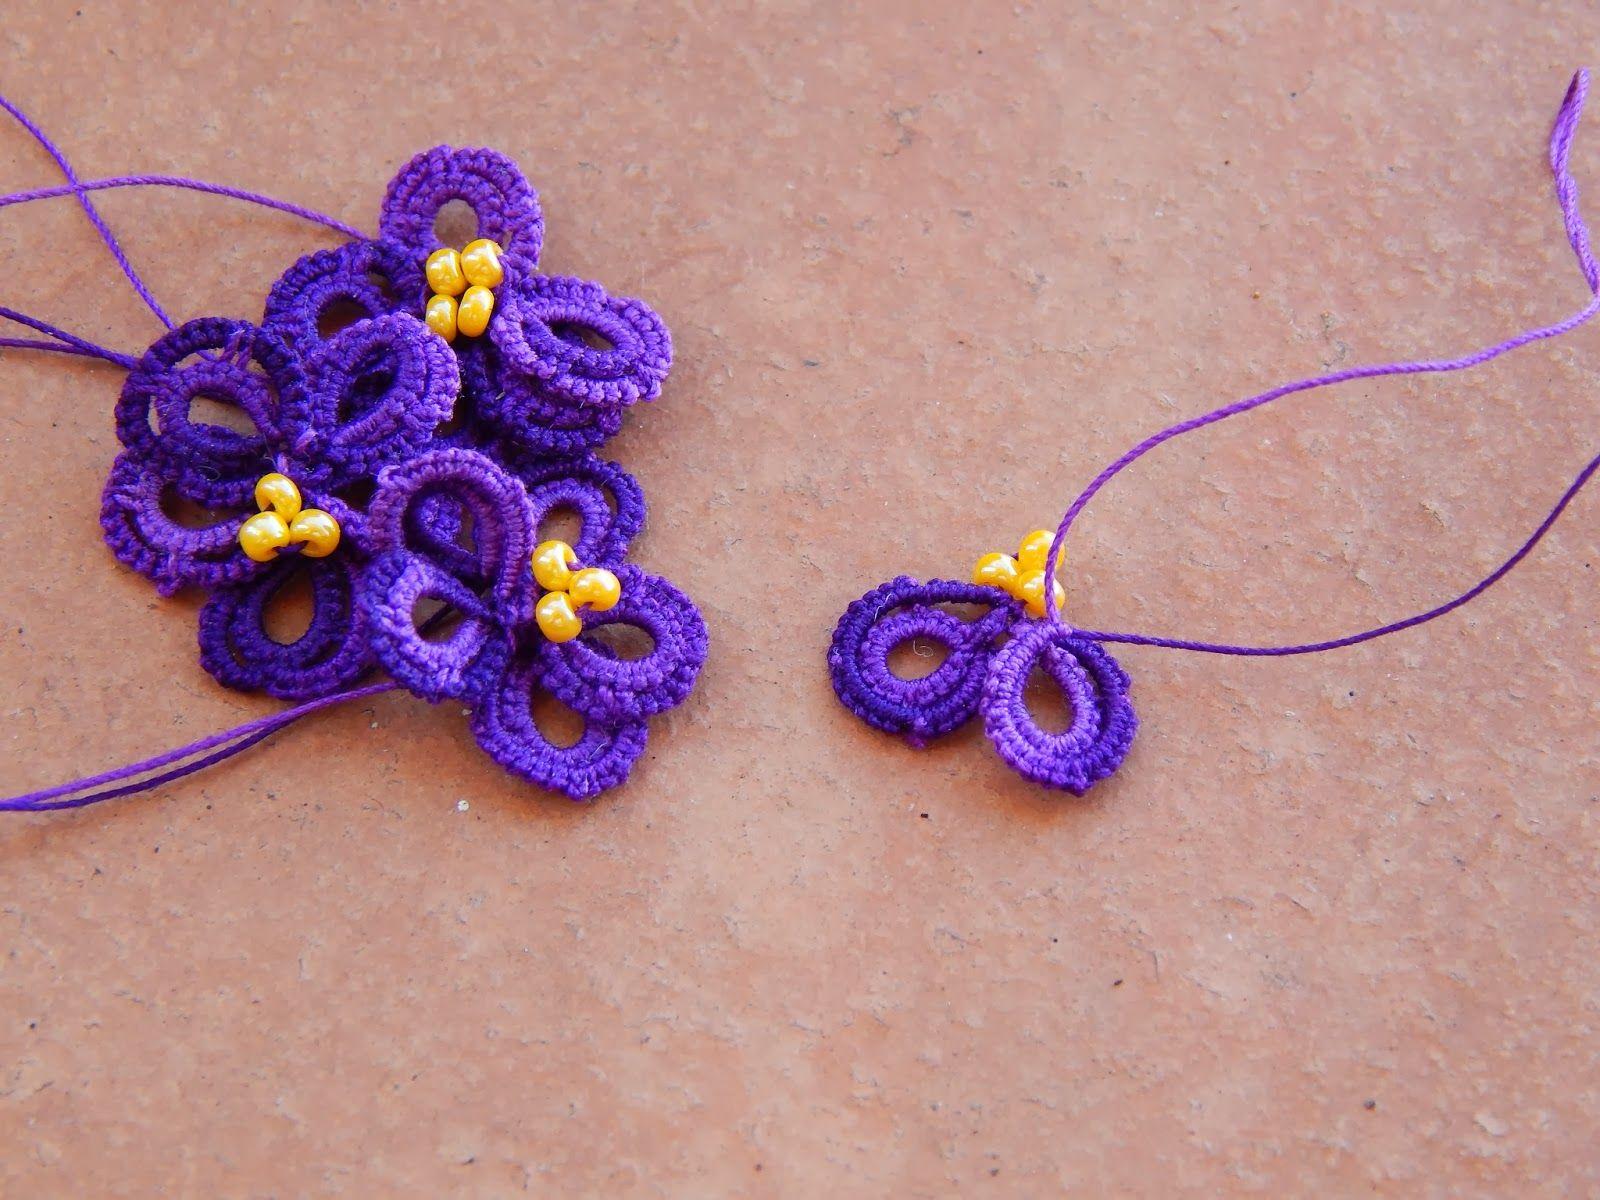 African Violet with tatting pattern at Carollyn's Tatting Blog: February's Frivolite flower!